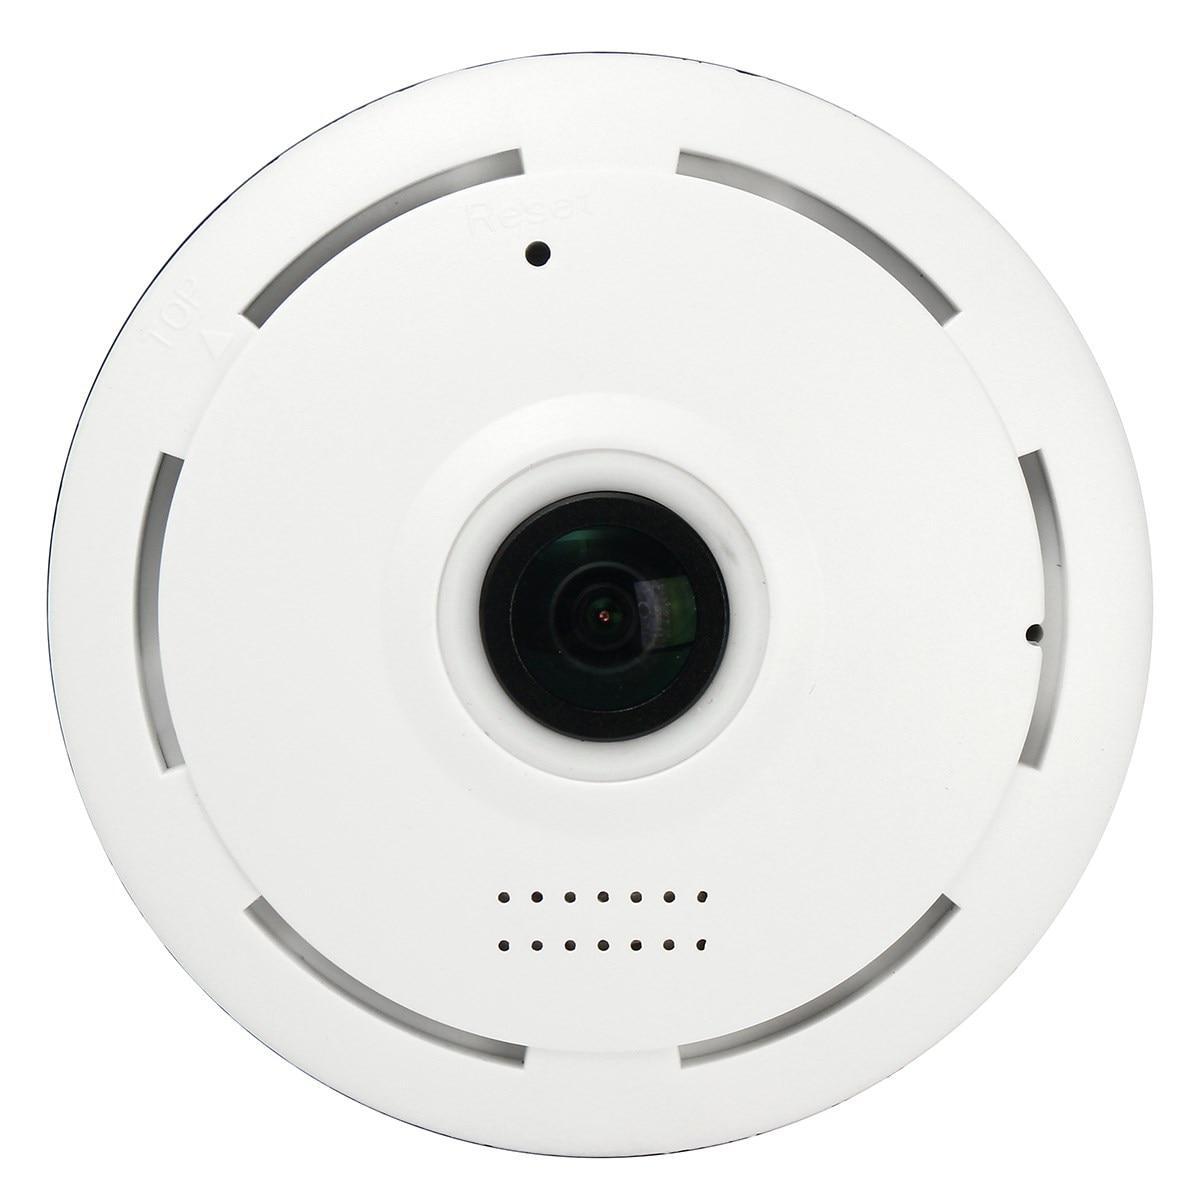 NEW Mini 360 Degree Wireless IP Camera Fisheye IR night vision 960P HD Panoramic  Surveillance CCTV Home Security<br>